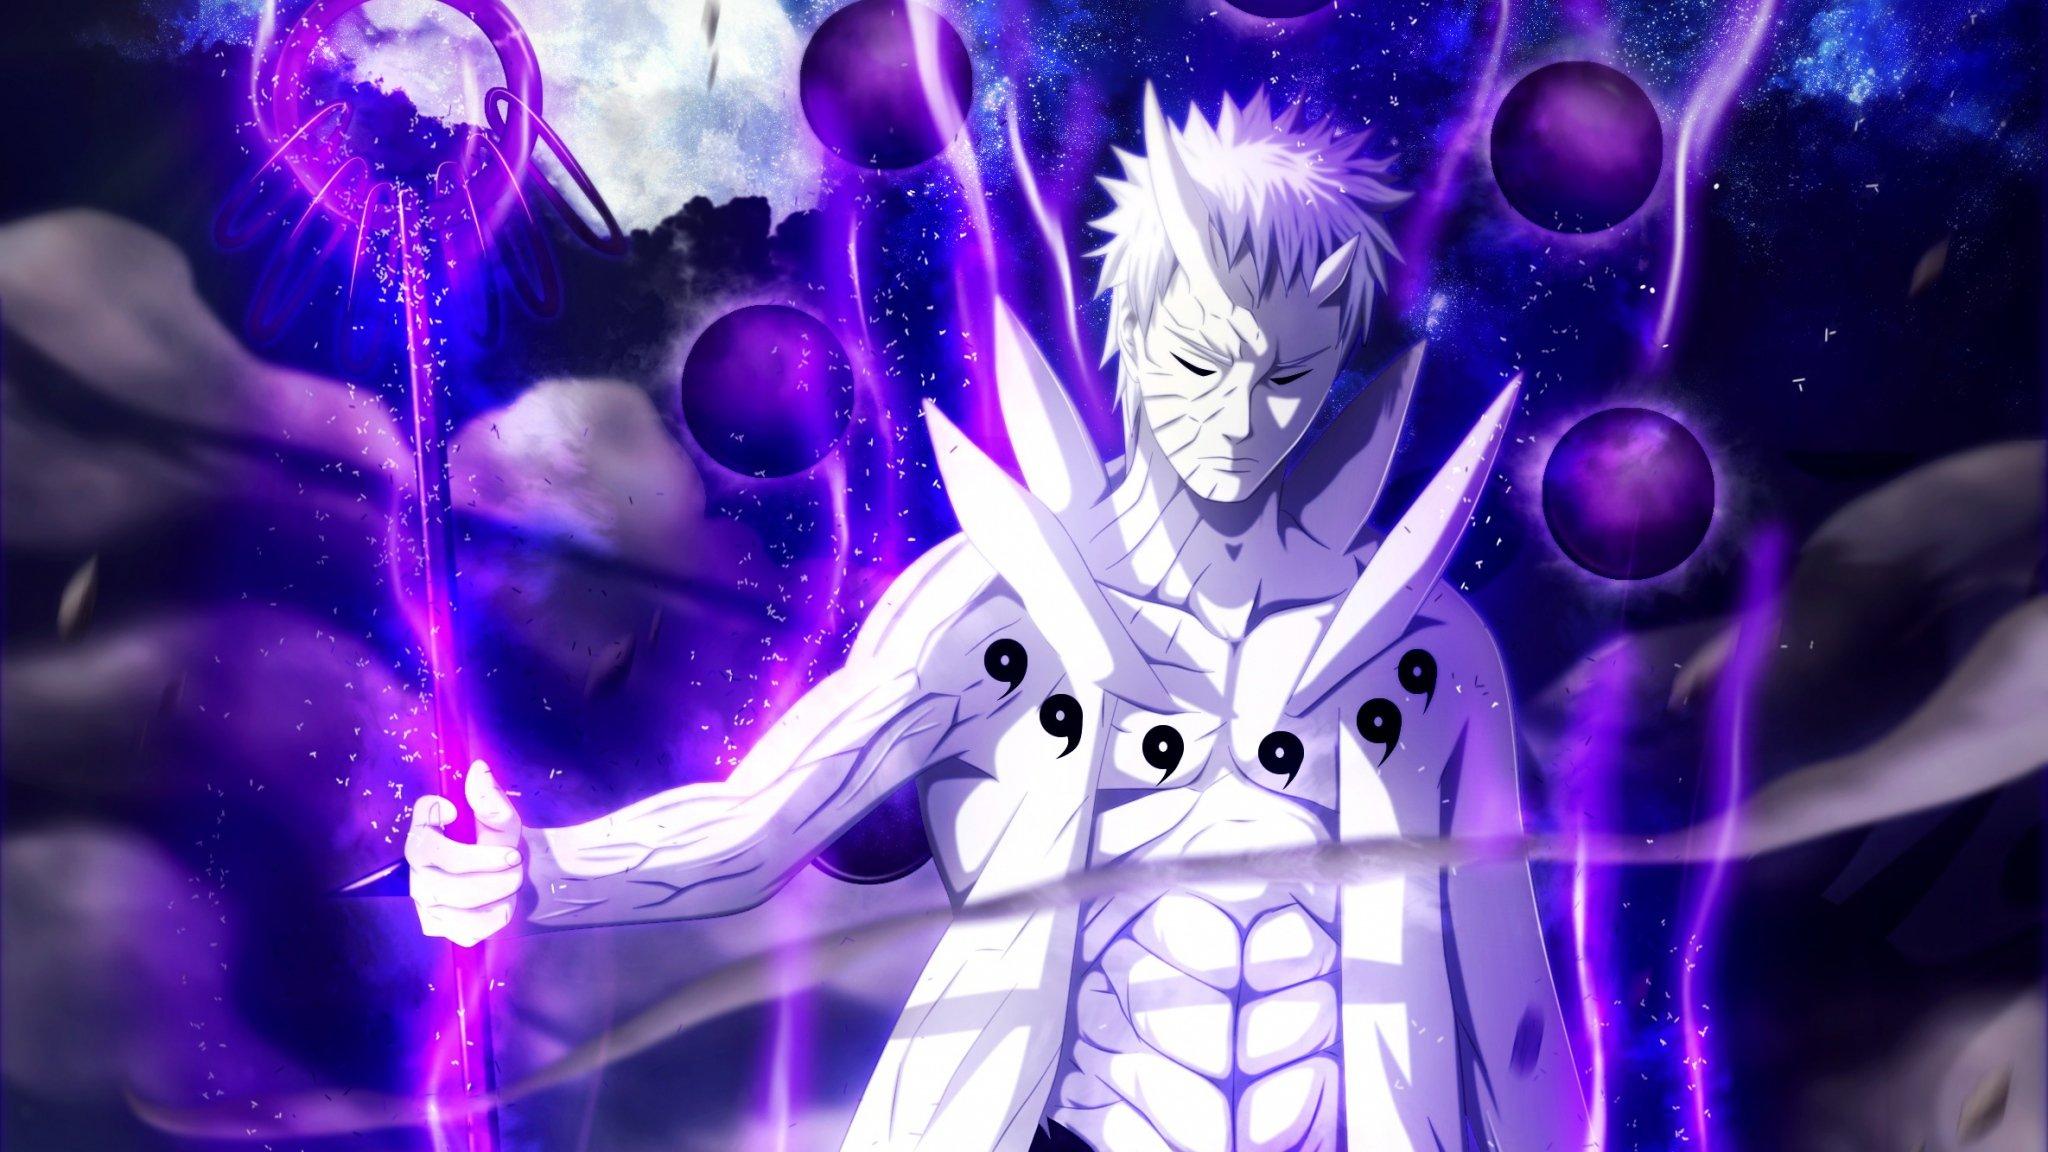 Free Download Download Wallpaper 2048x1152 Kortex Anime